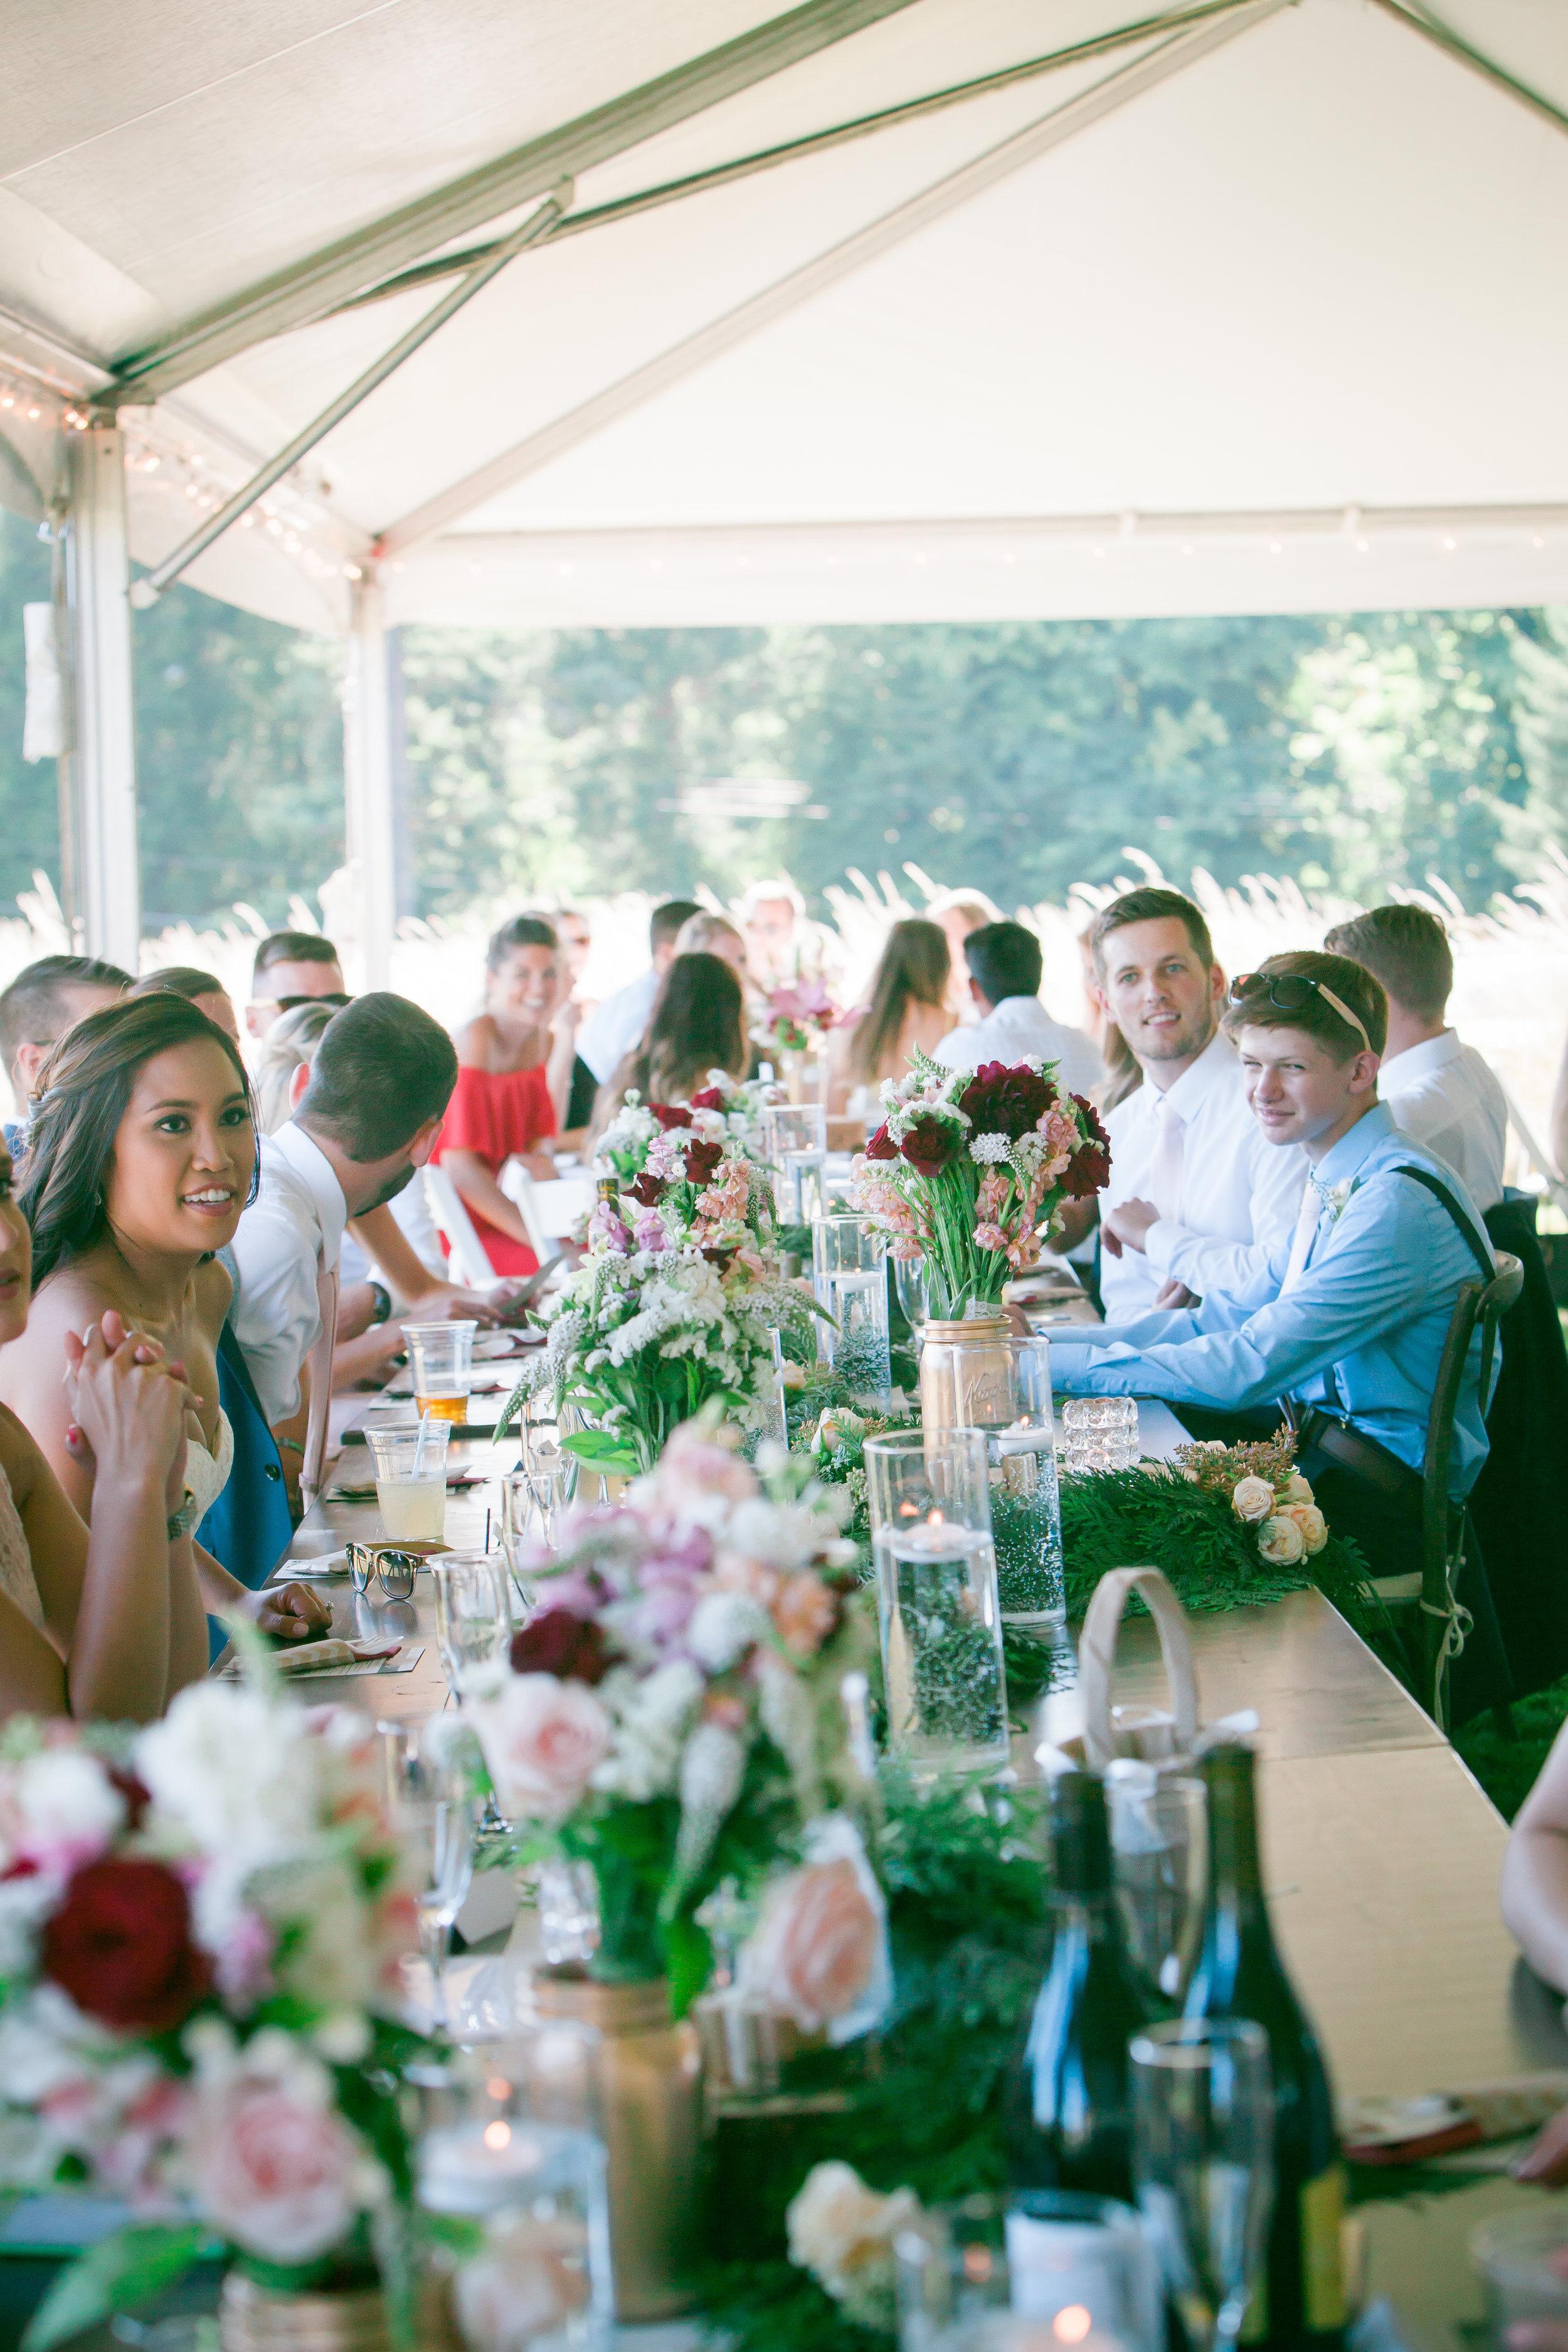 Bridalbliss.com | West Linn Wedding | Oregon Event Planning and Design | MJS Photography